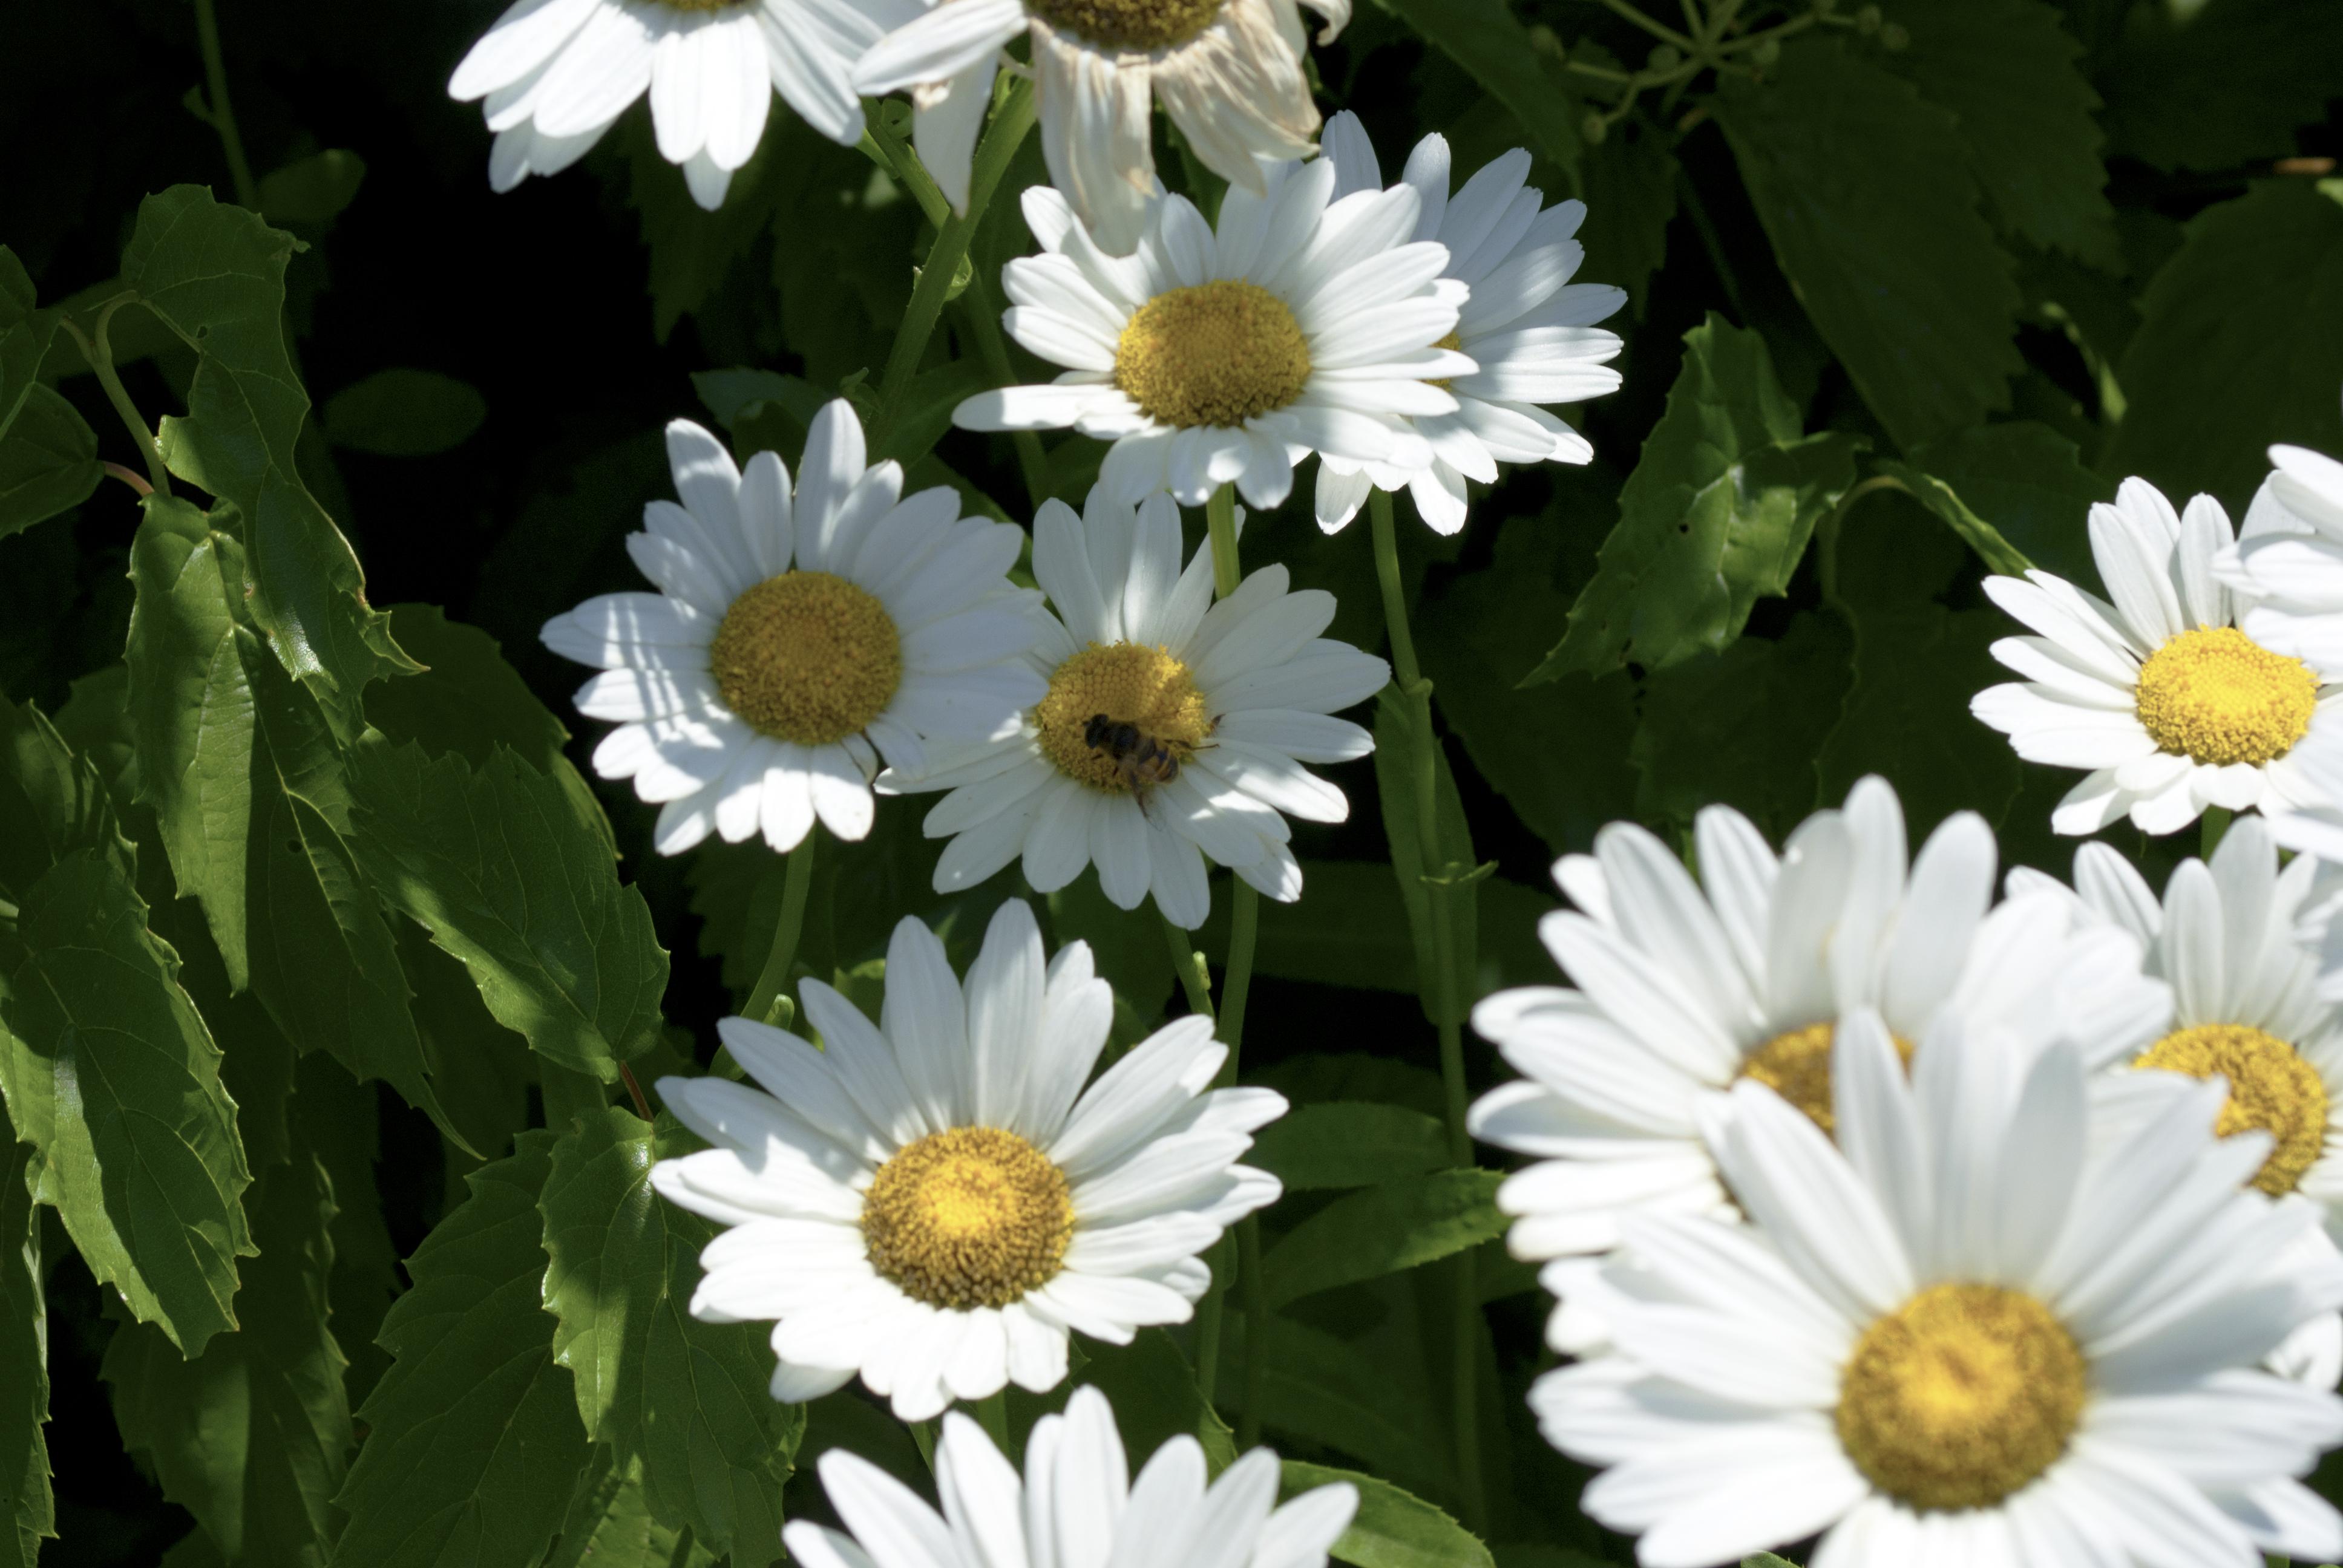 Daisies photo